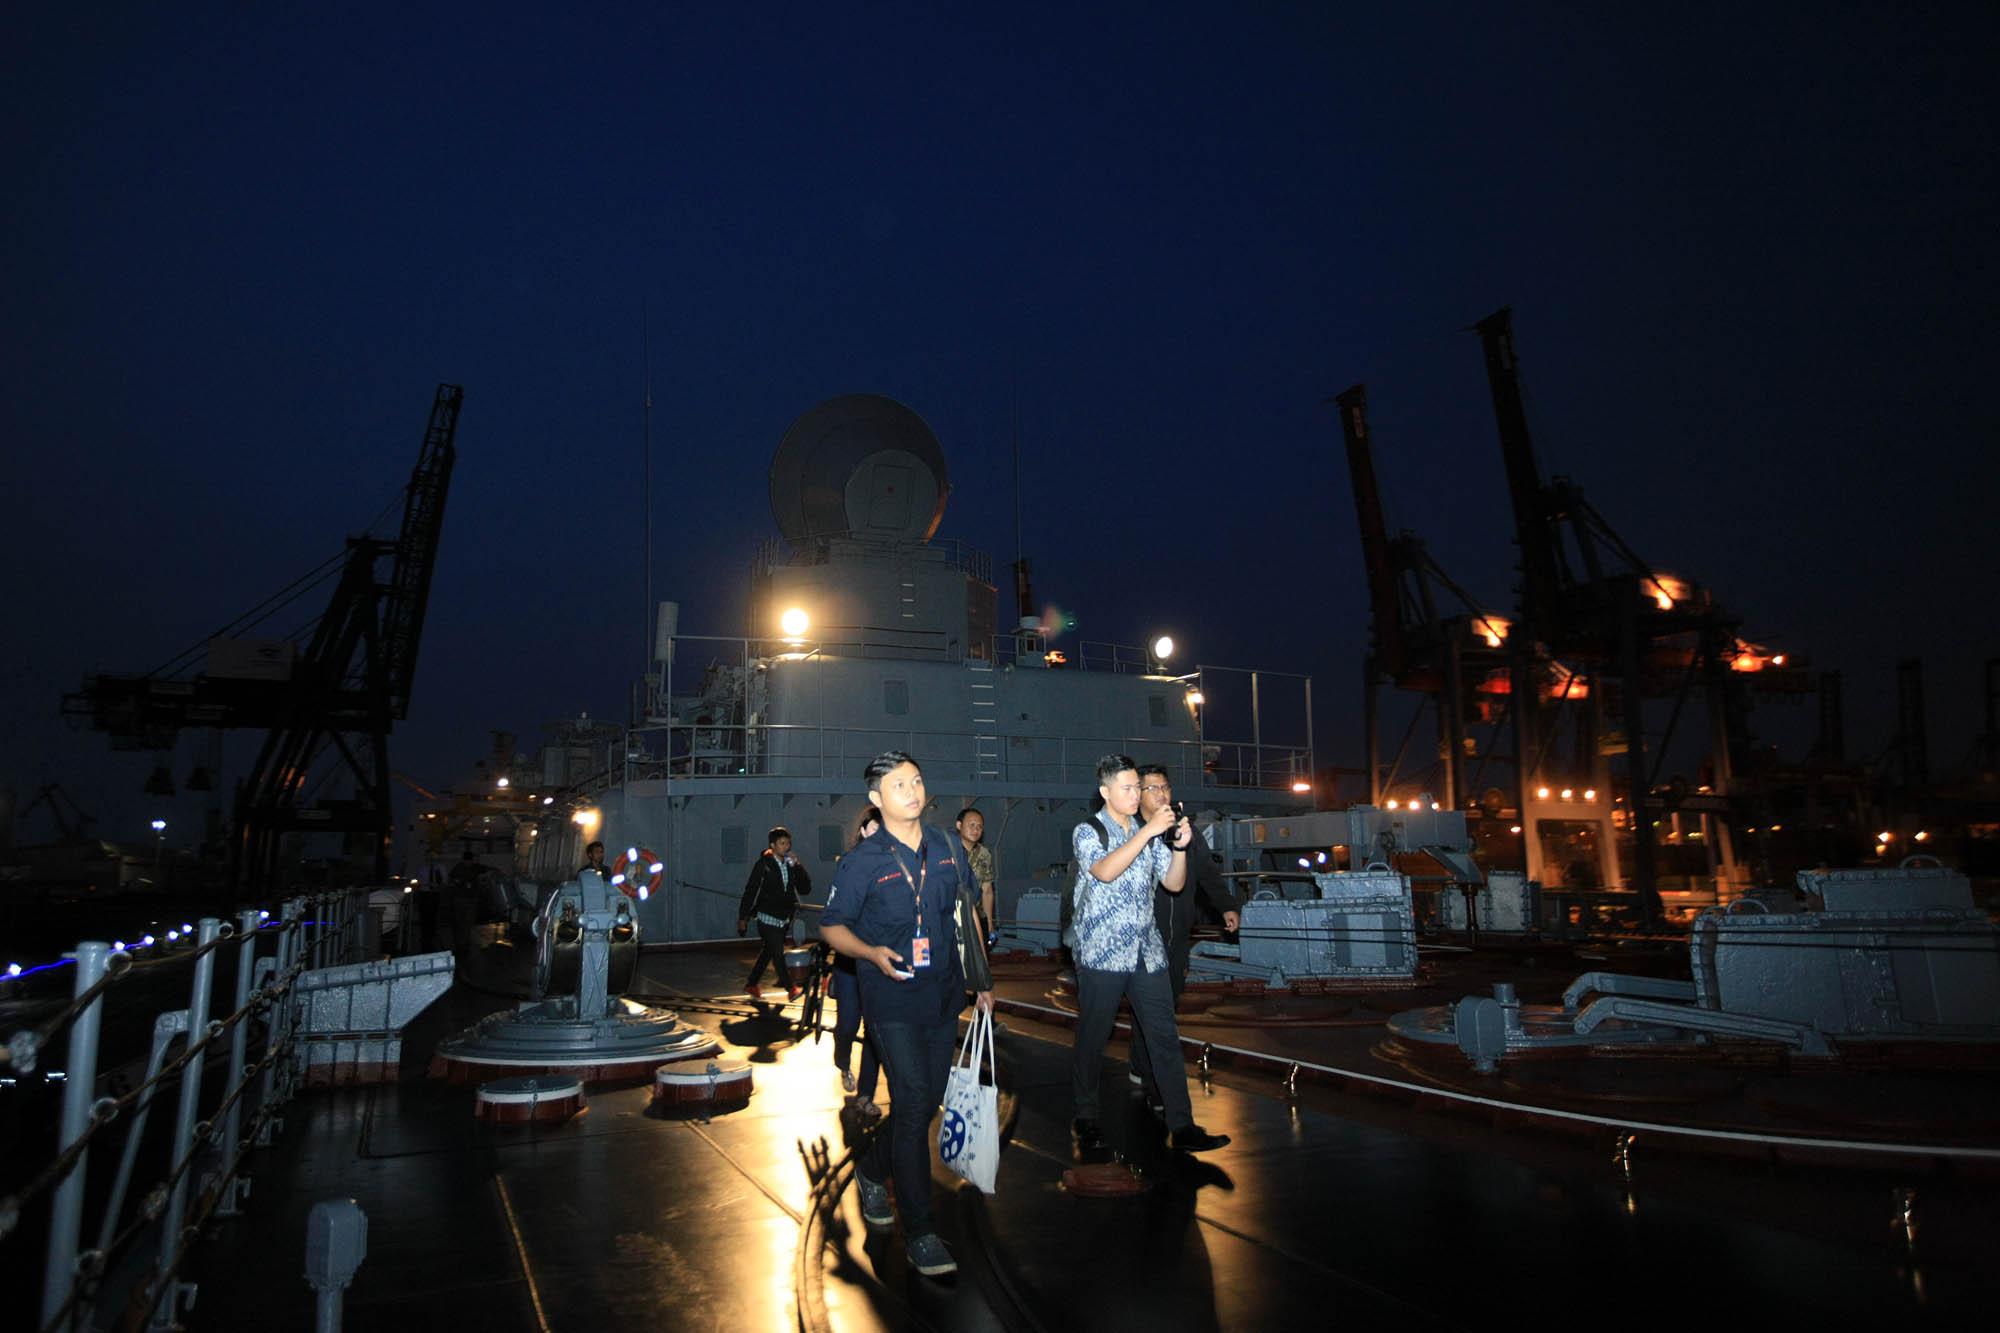 Beberapa wartawan meninjau kapal jelajah 'Varyag' saat bersandar di Pelabuhan JICT 2, Tanjung Priok, Jakarta, Selasa (23/5). Kepada para wartawan, Komandan Kapal 'Varyag' Alexei Ulyanenko menyebutkan bahwa ada 510 orang awak kapal yang bertugas di kapal jelajah milik Armada Pasifik Rusia ini.